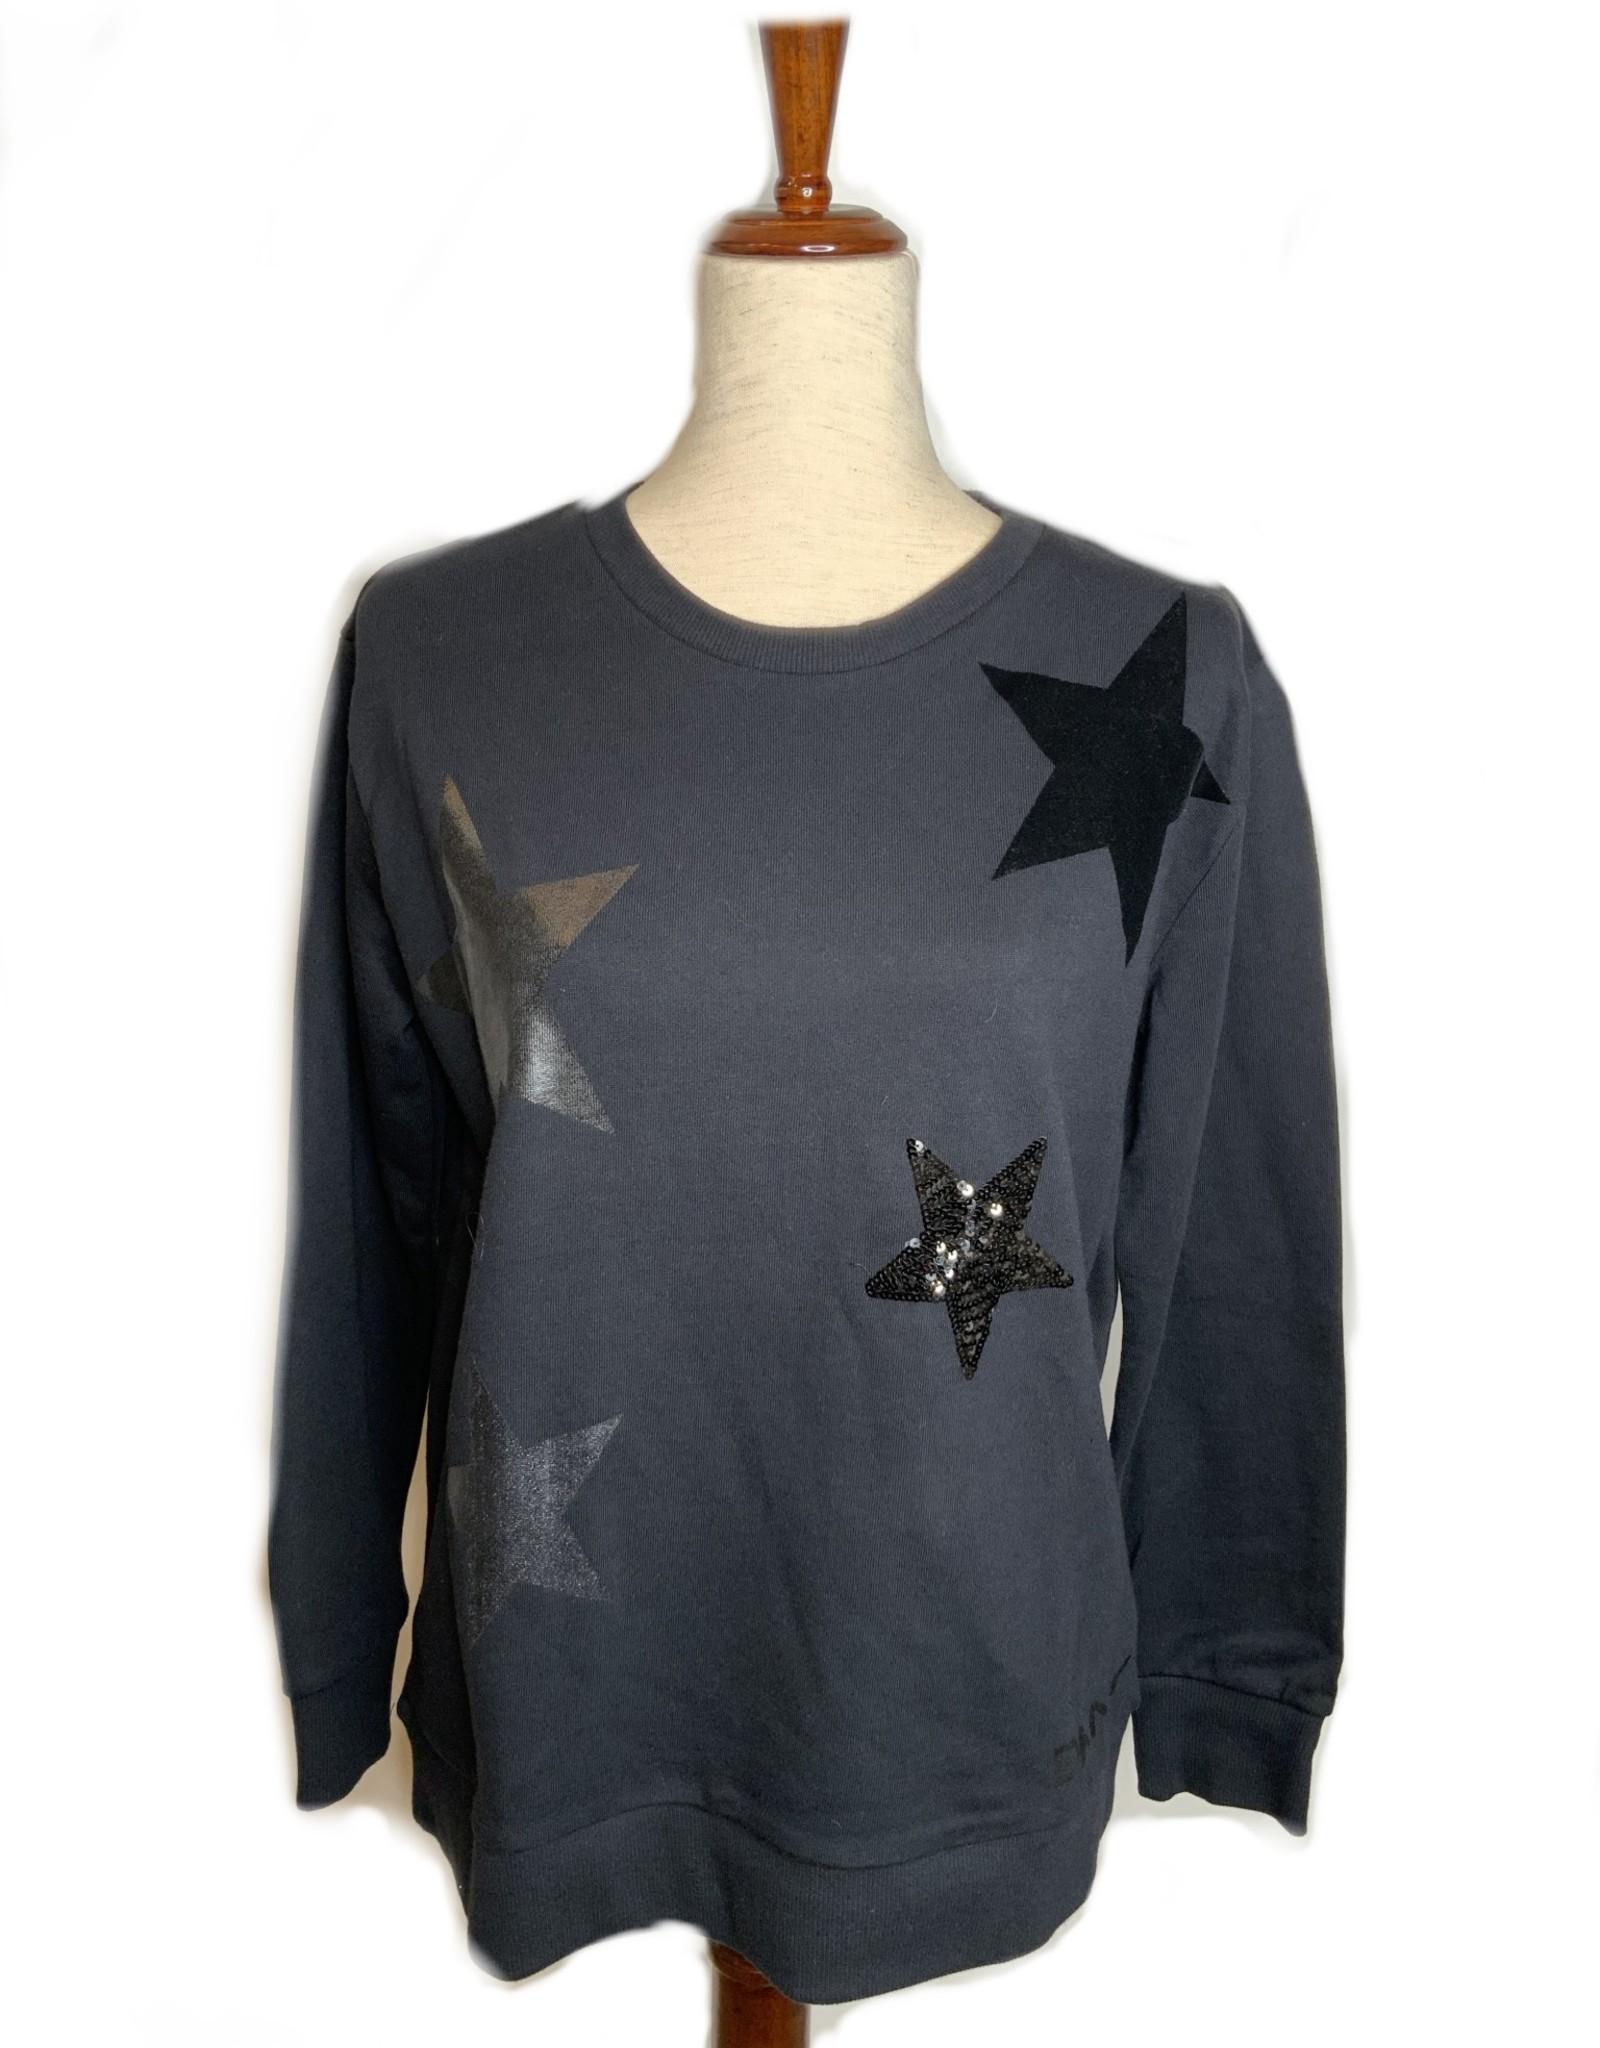 DKNY DKNY  Sweatshirt Sequin Foil Star